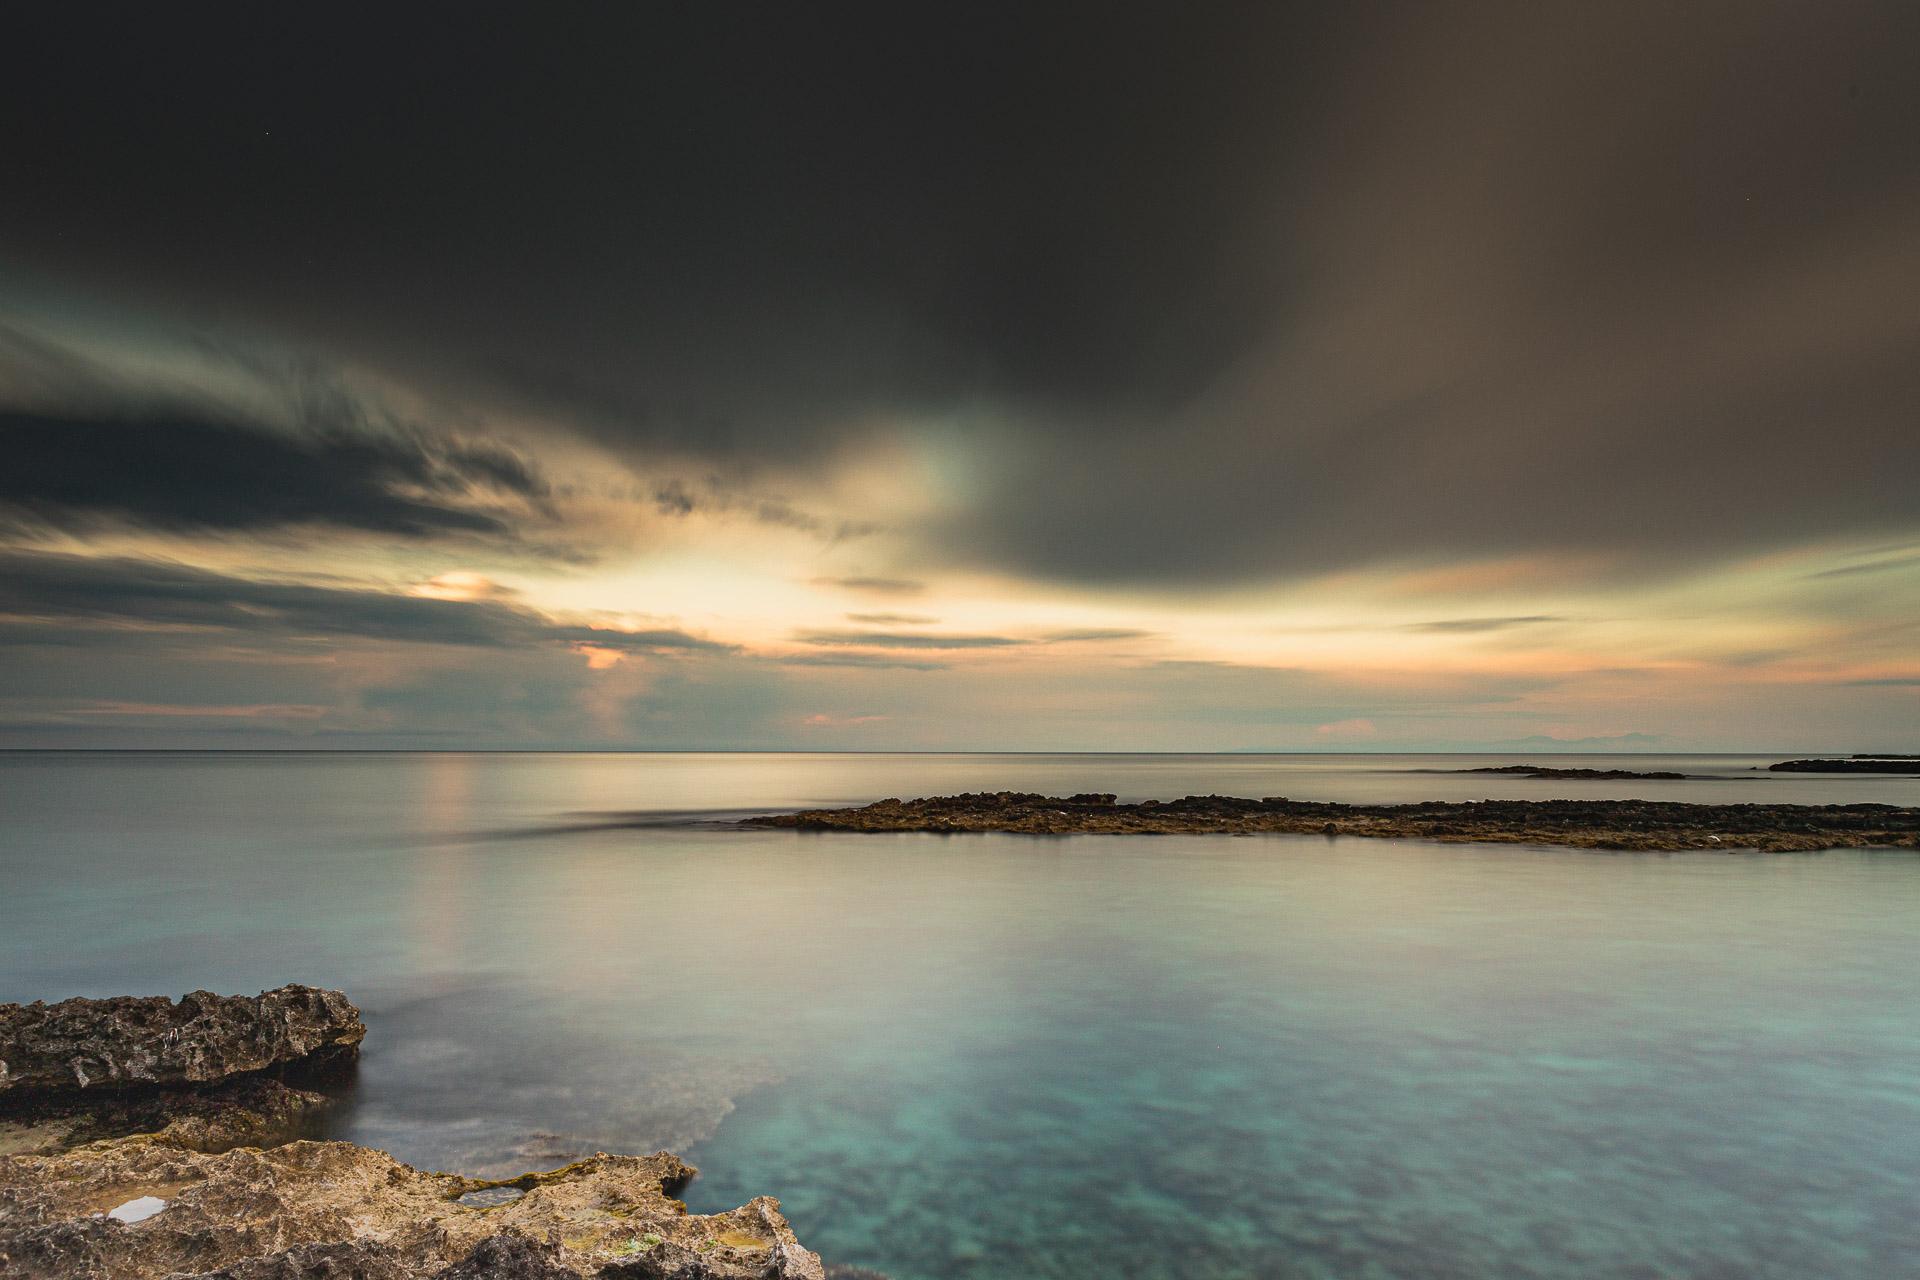 Sunset seascape long exposure photography